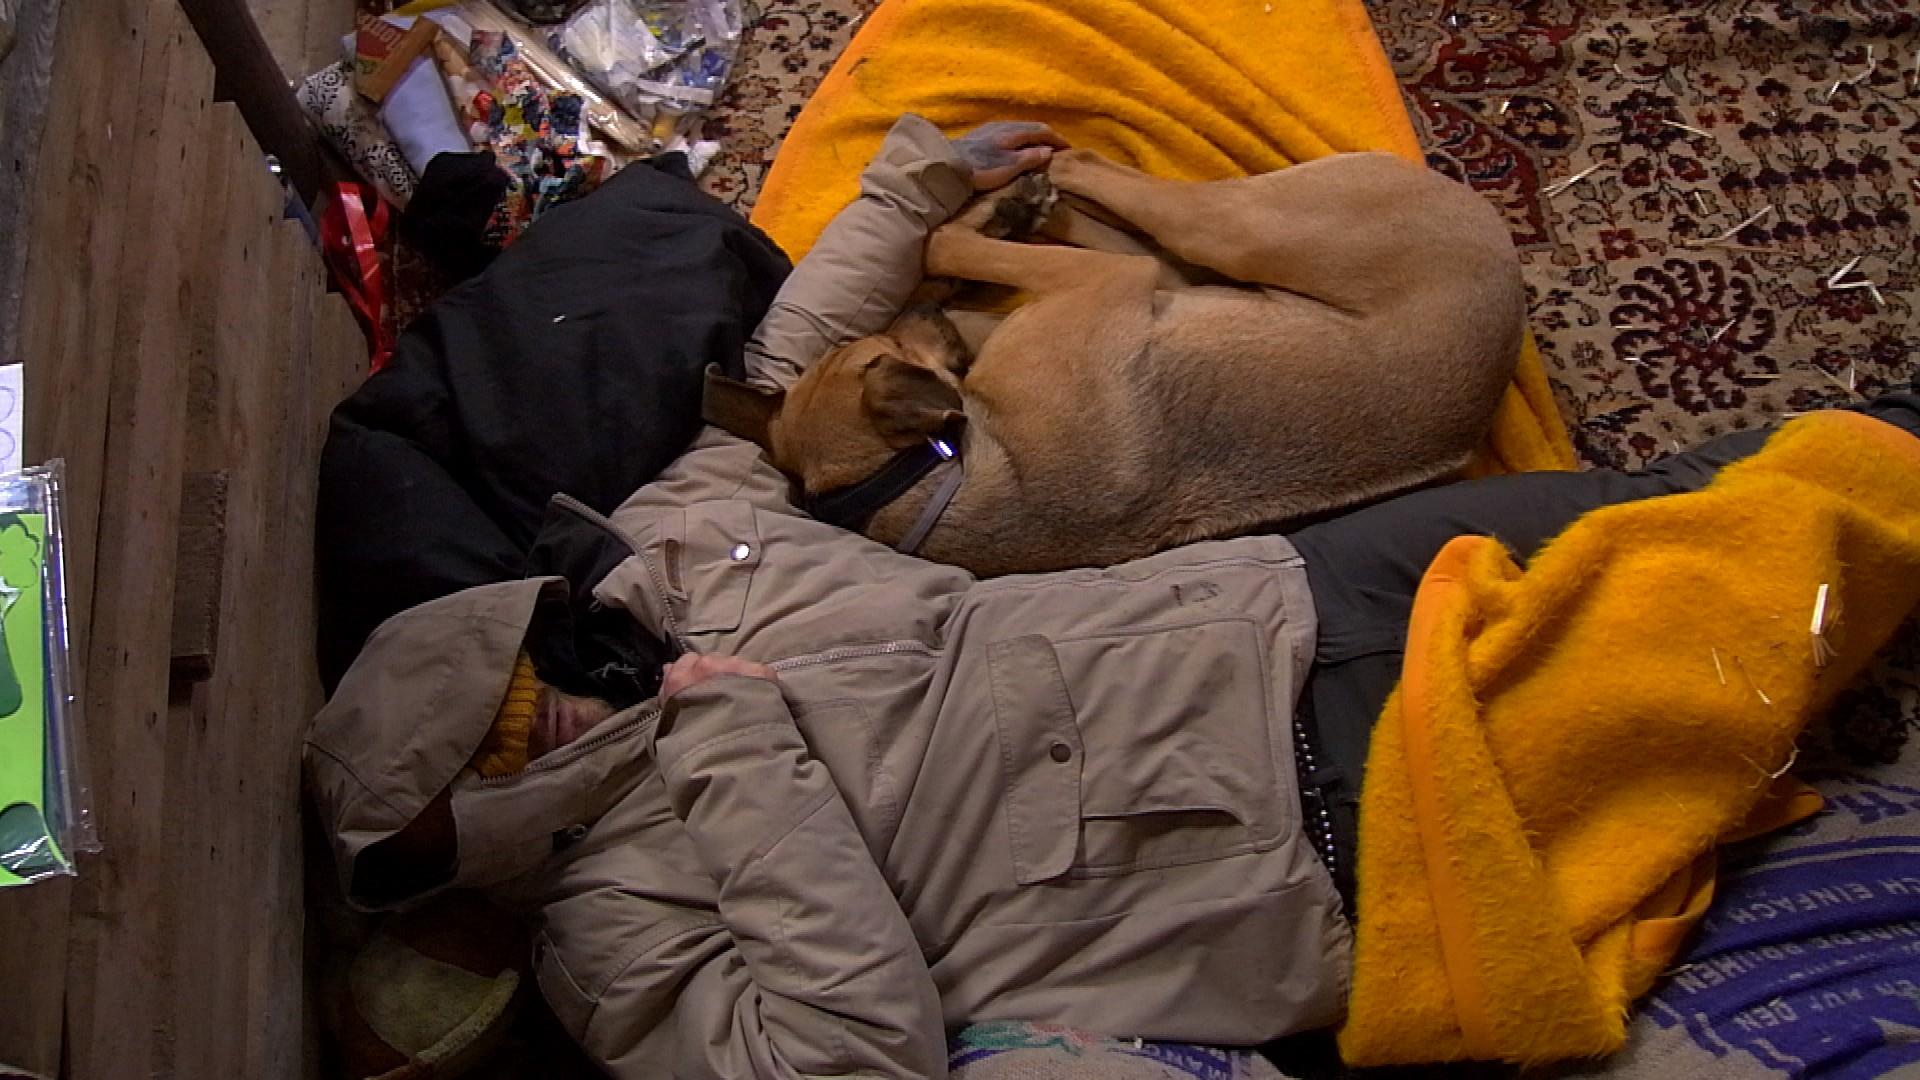 Newtopia Hund Paula Hans schlafen Folge 31 Episode 07.04.2015